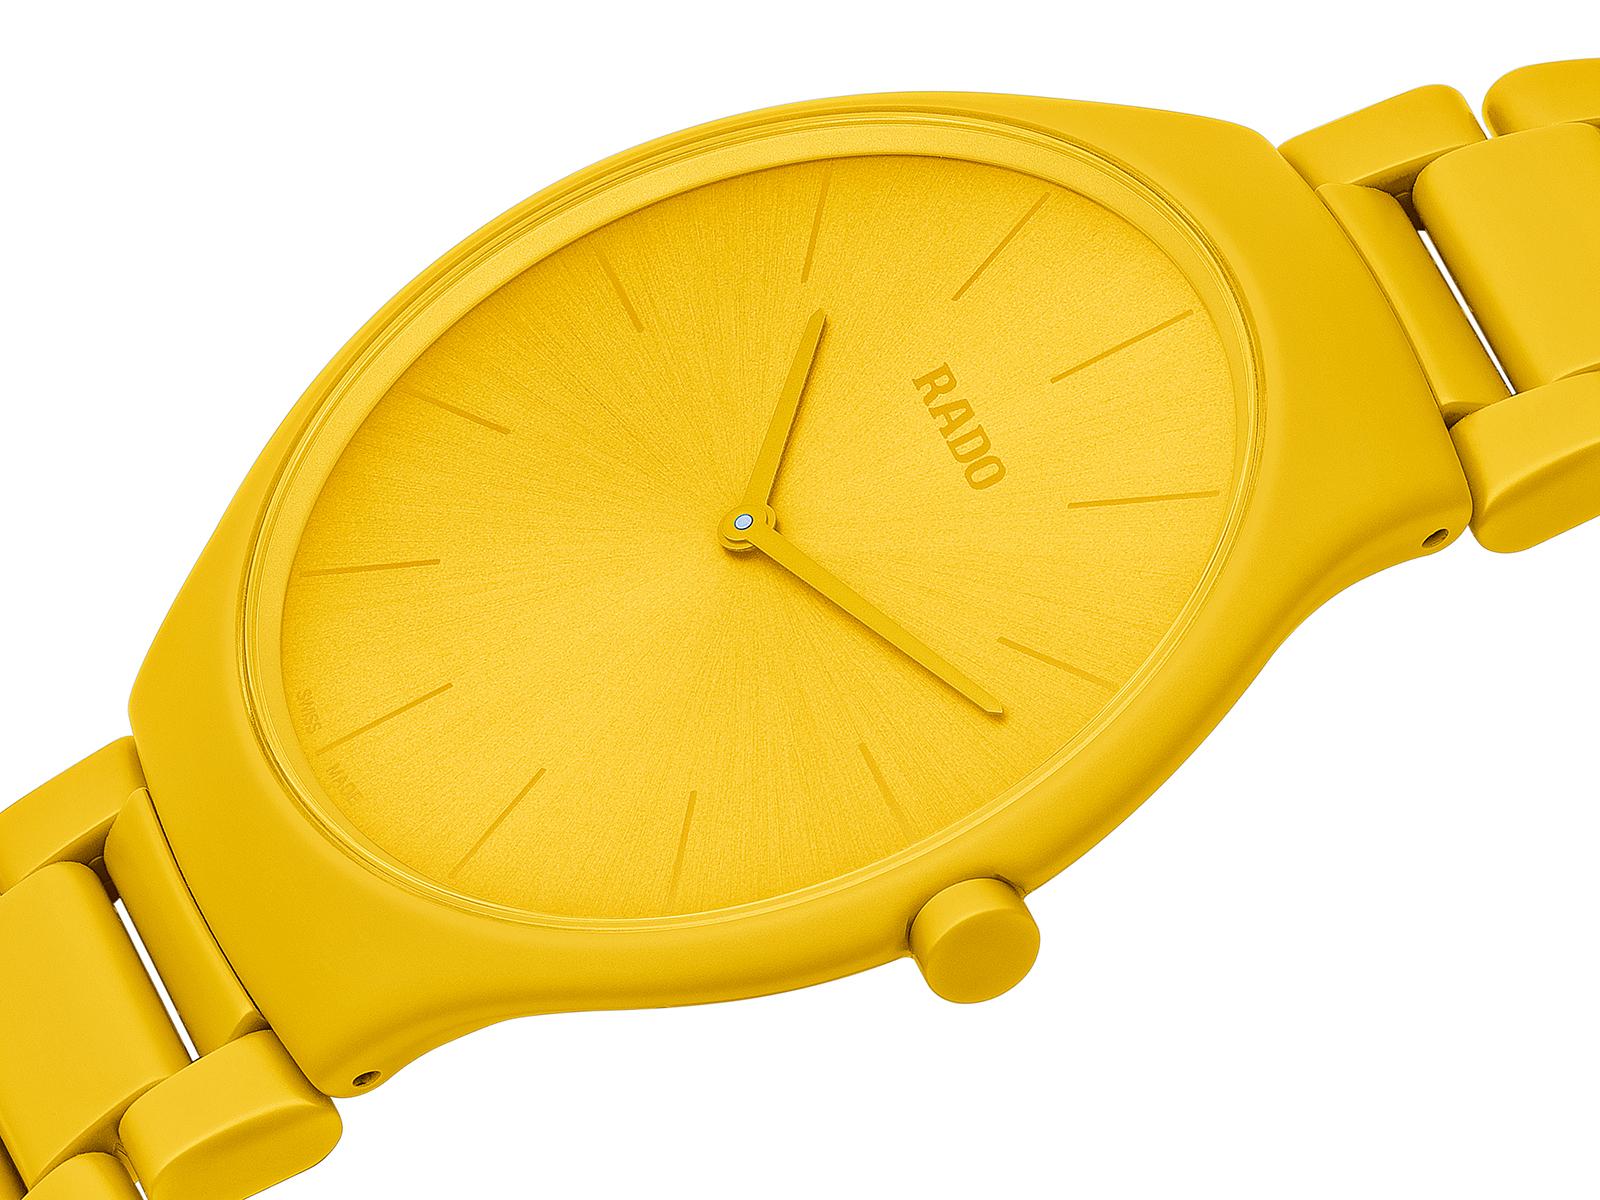 【RADO ラドー】True Thinline Les Couleurs™ Le Corbusier  Sunshine yellow 4320W シンライン ル・コルビュジエ(イエロー)/正規輸入品